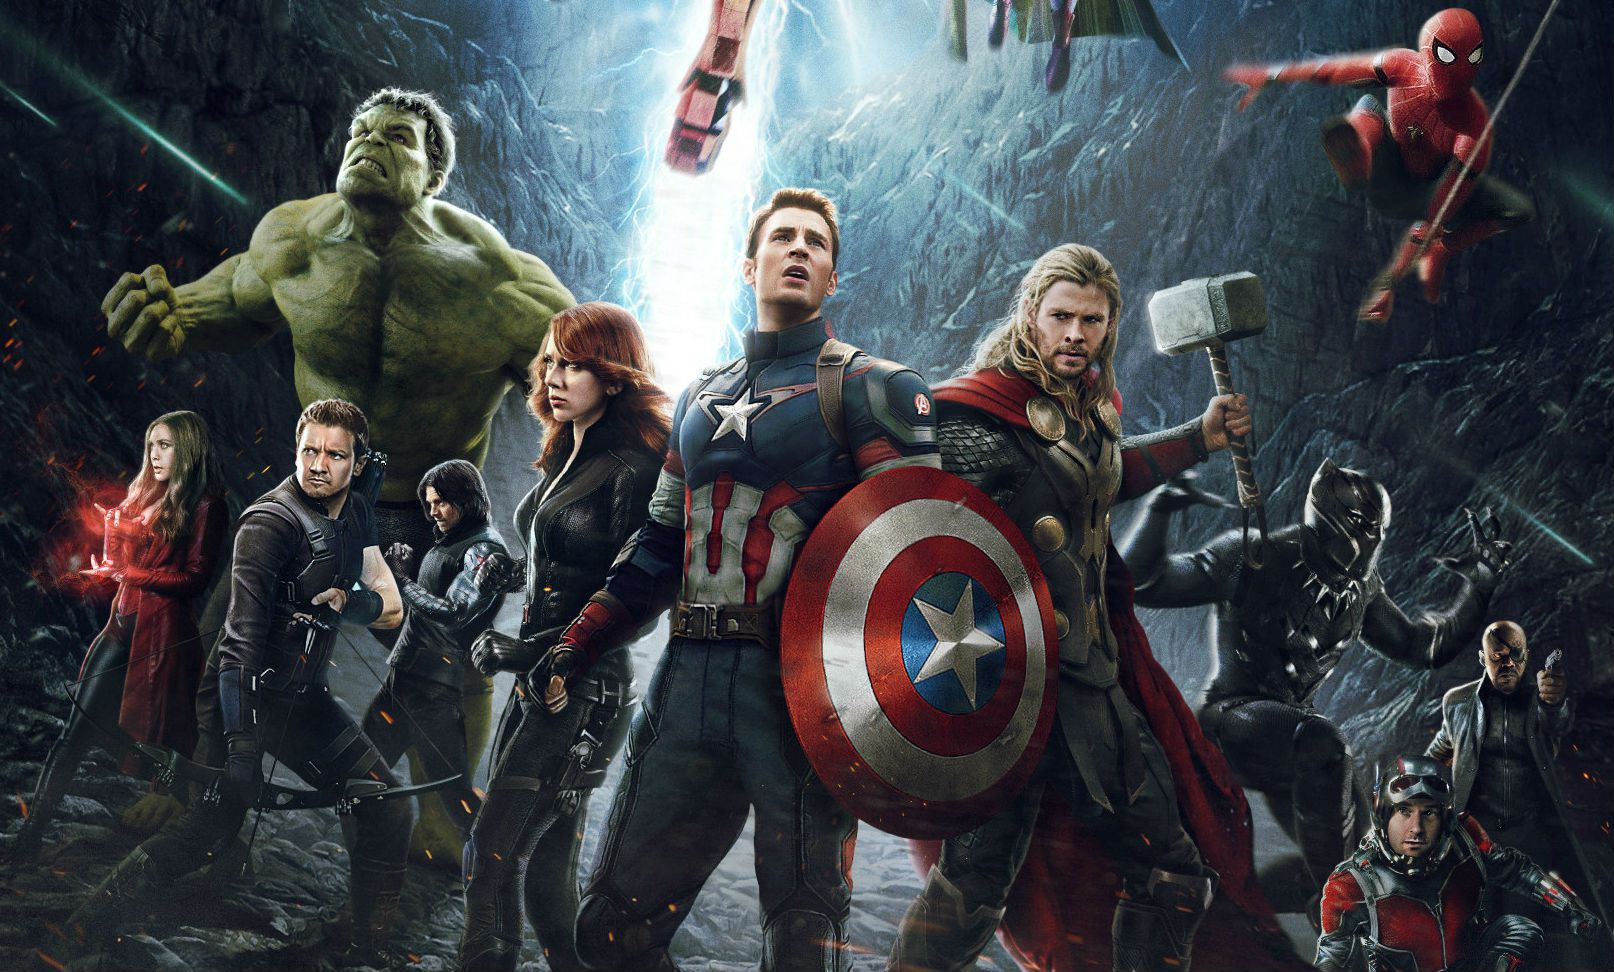 Rumores del titulo de Avengers 4